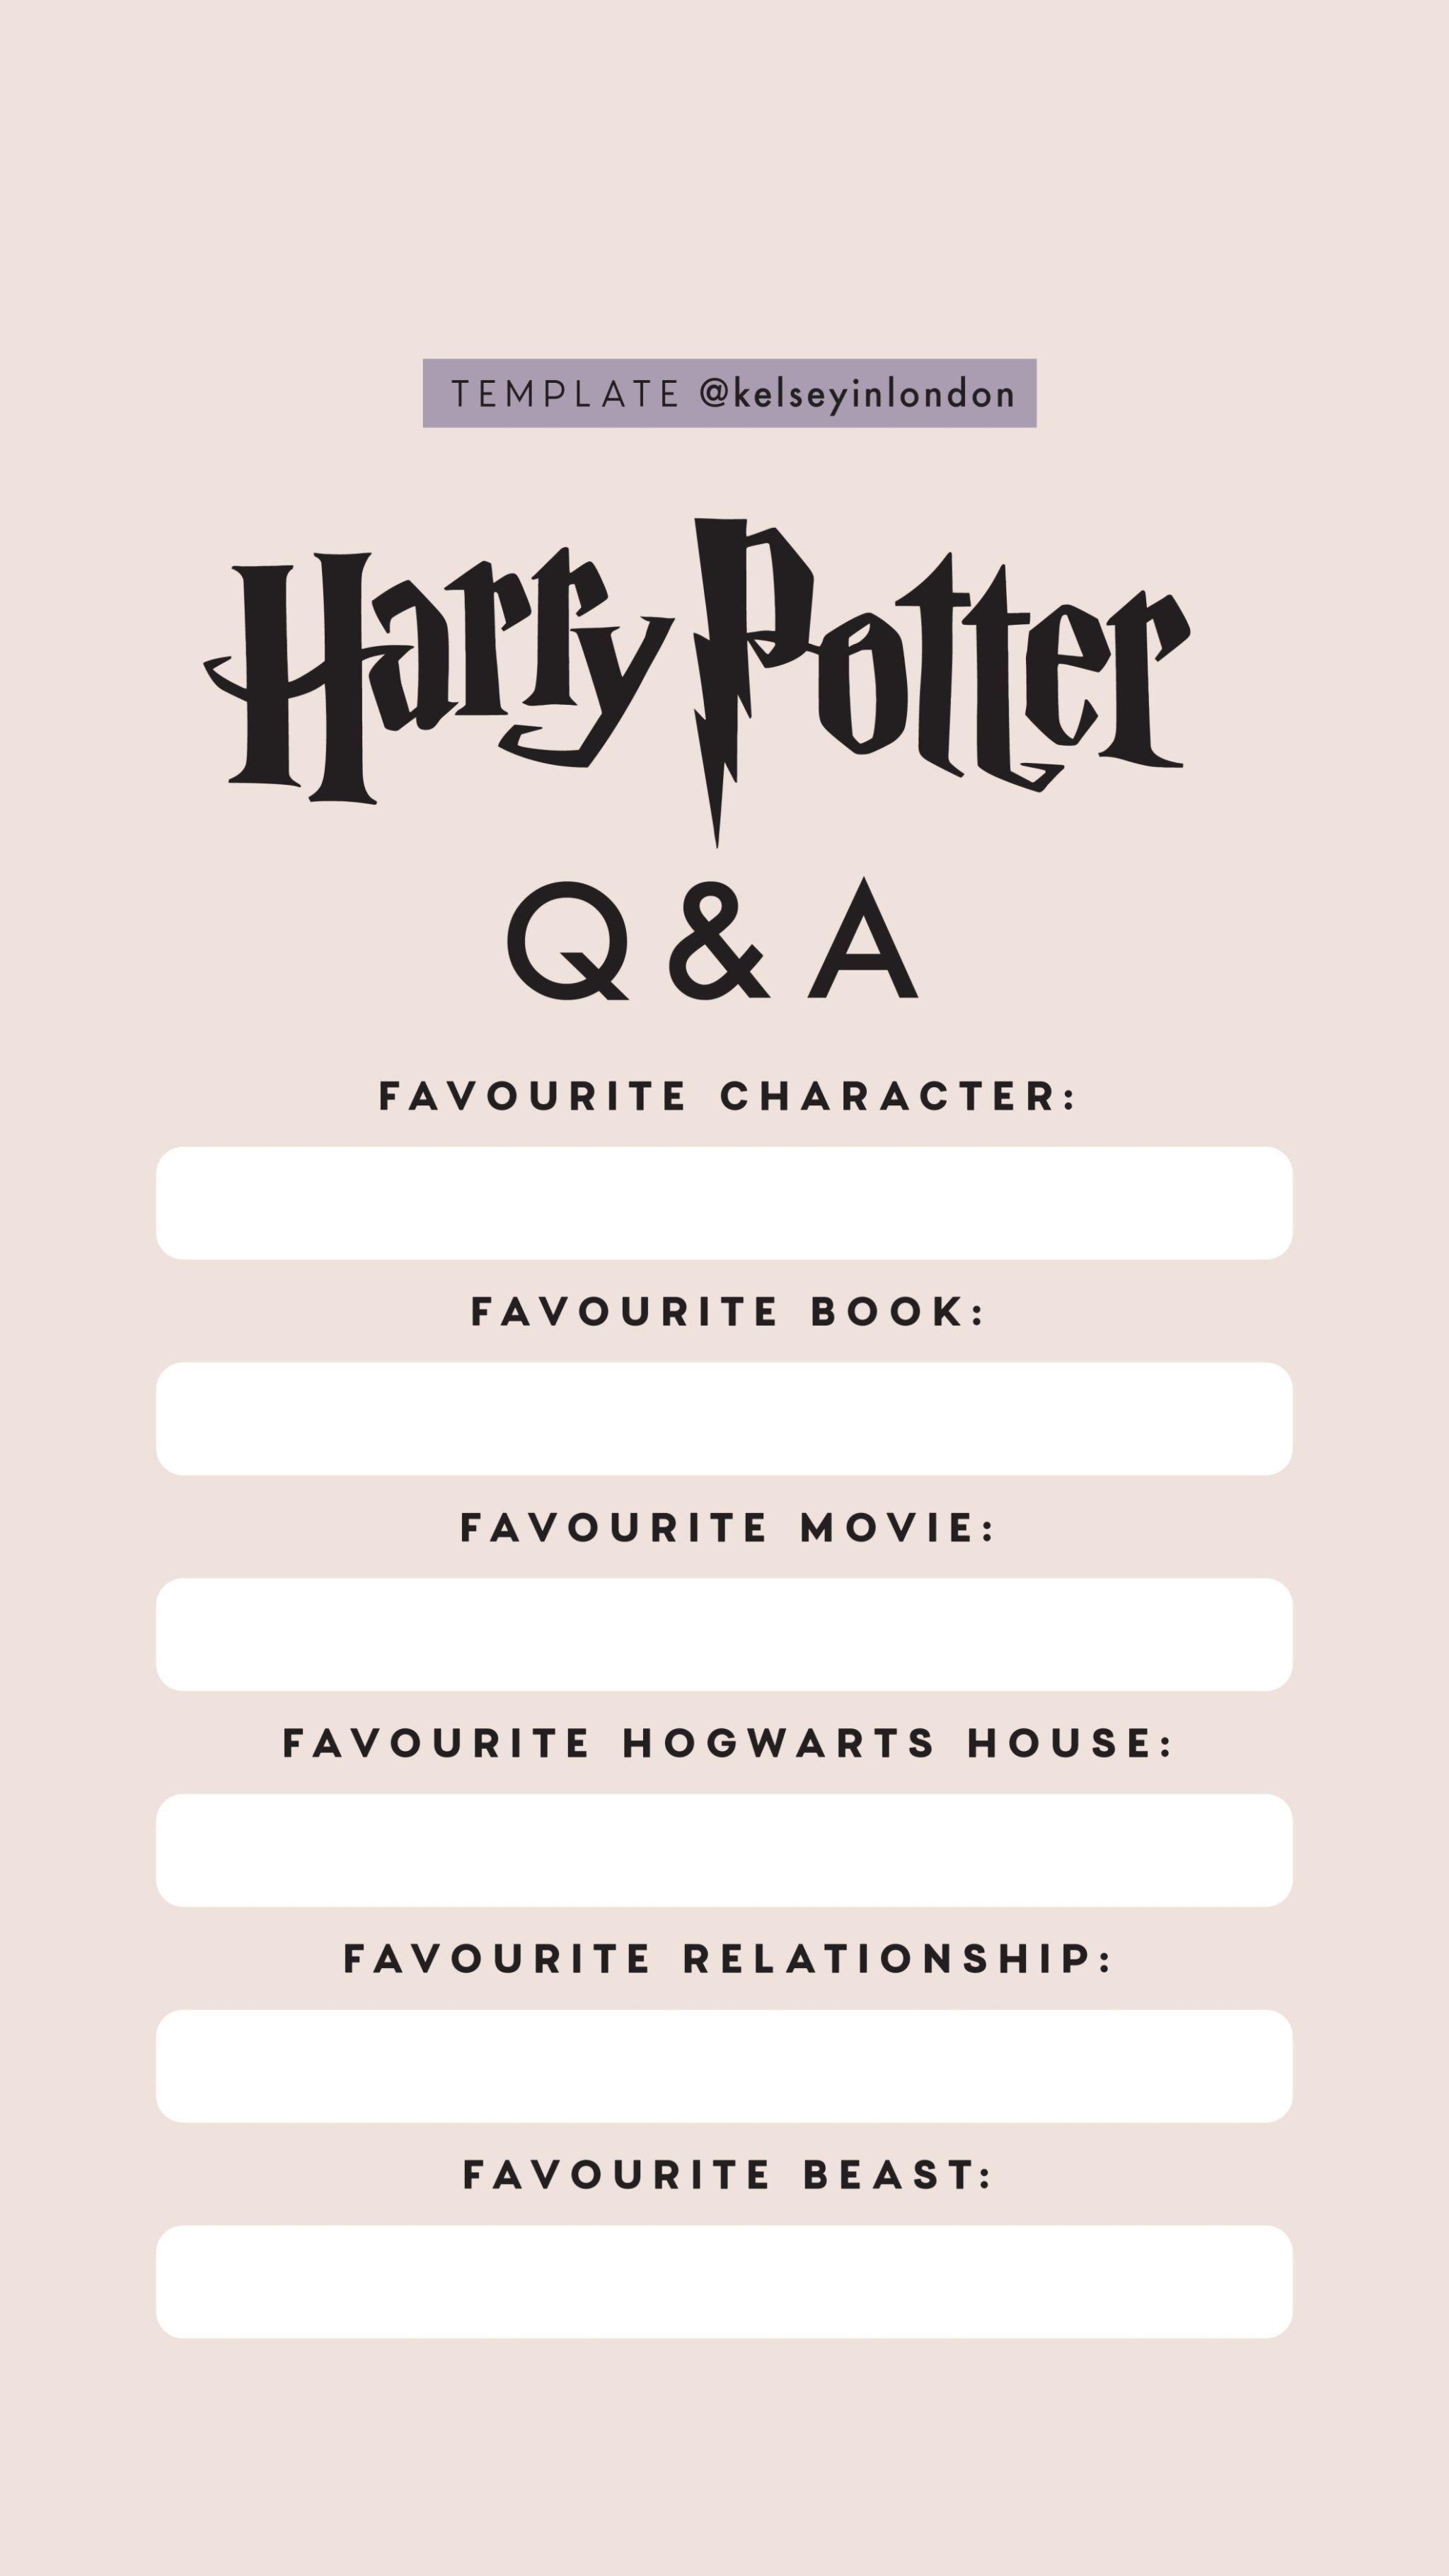 Movies Movies To Watch Movies To Watch List Movies To Watch On Netflix Bingew Cuestionario De Harry Potter Imagenes De Harry Potter Harry Potter Fanfiction